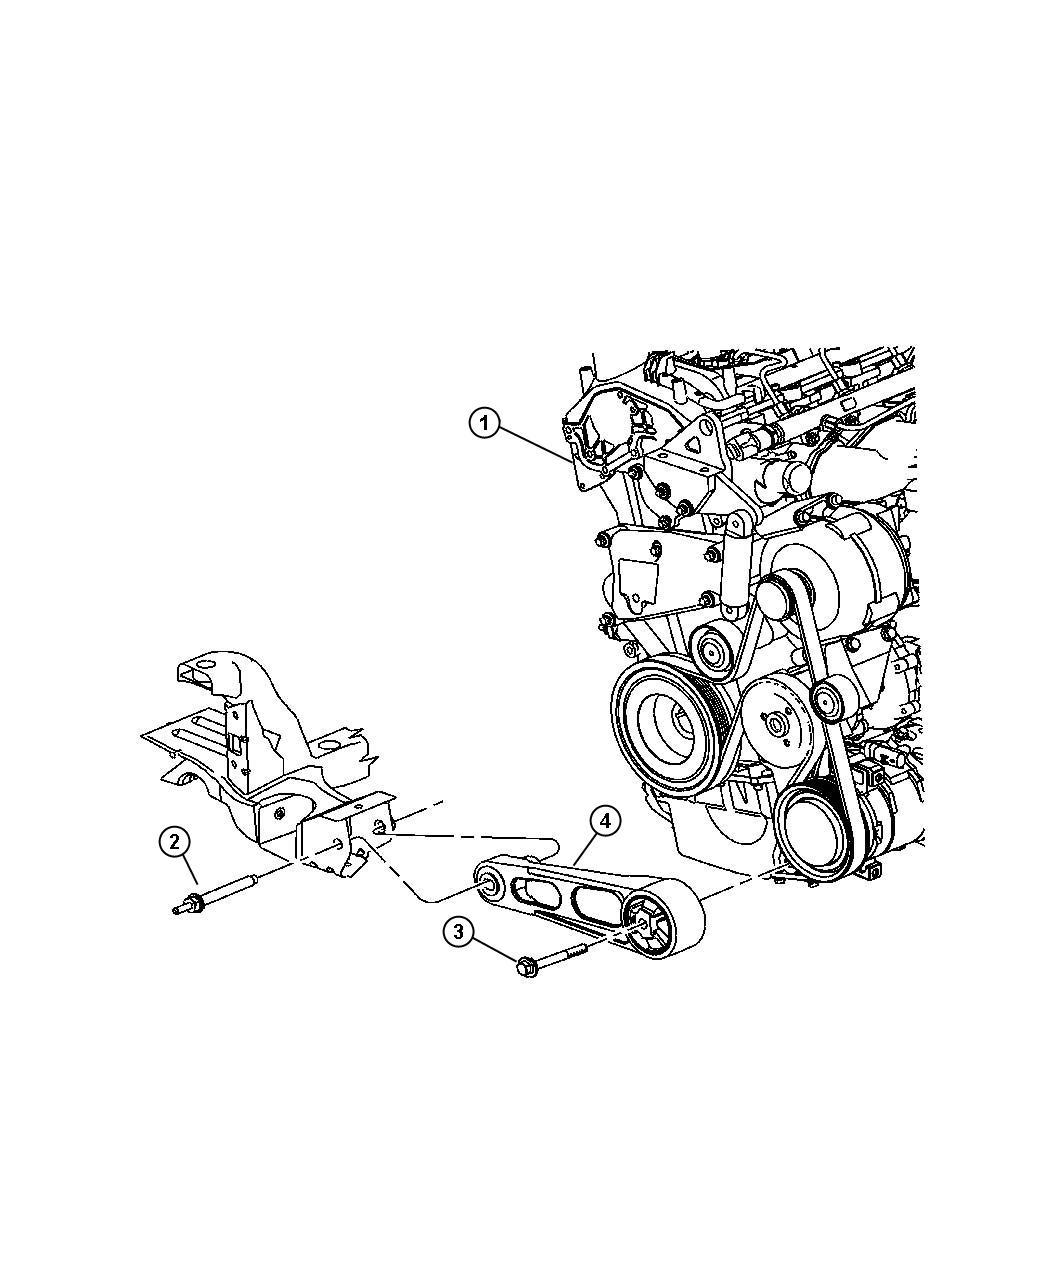 Jeep Patriot Isolator, strut. Torque reaction